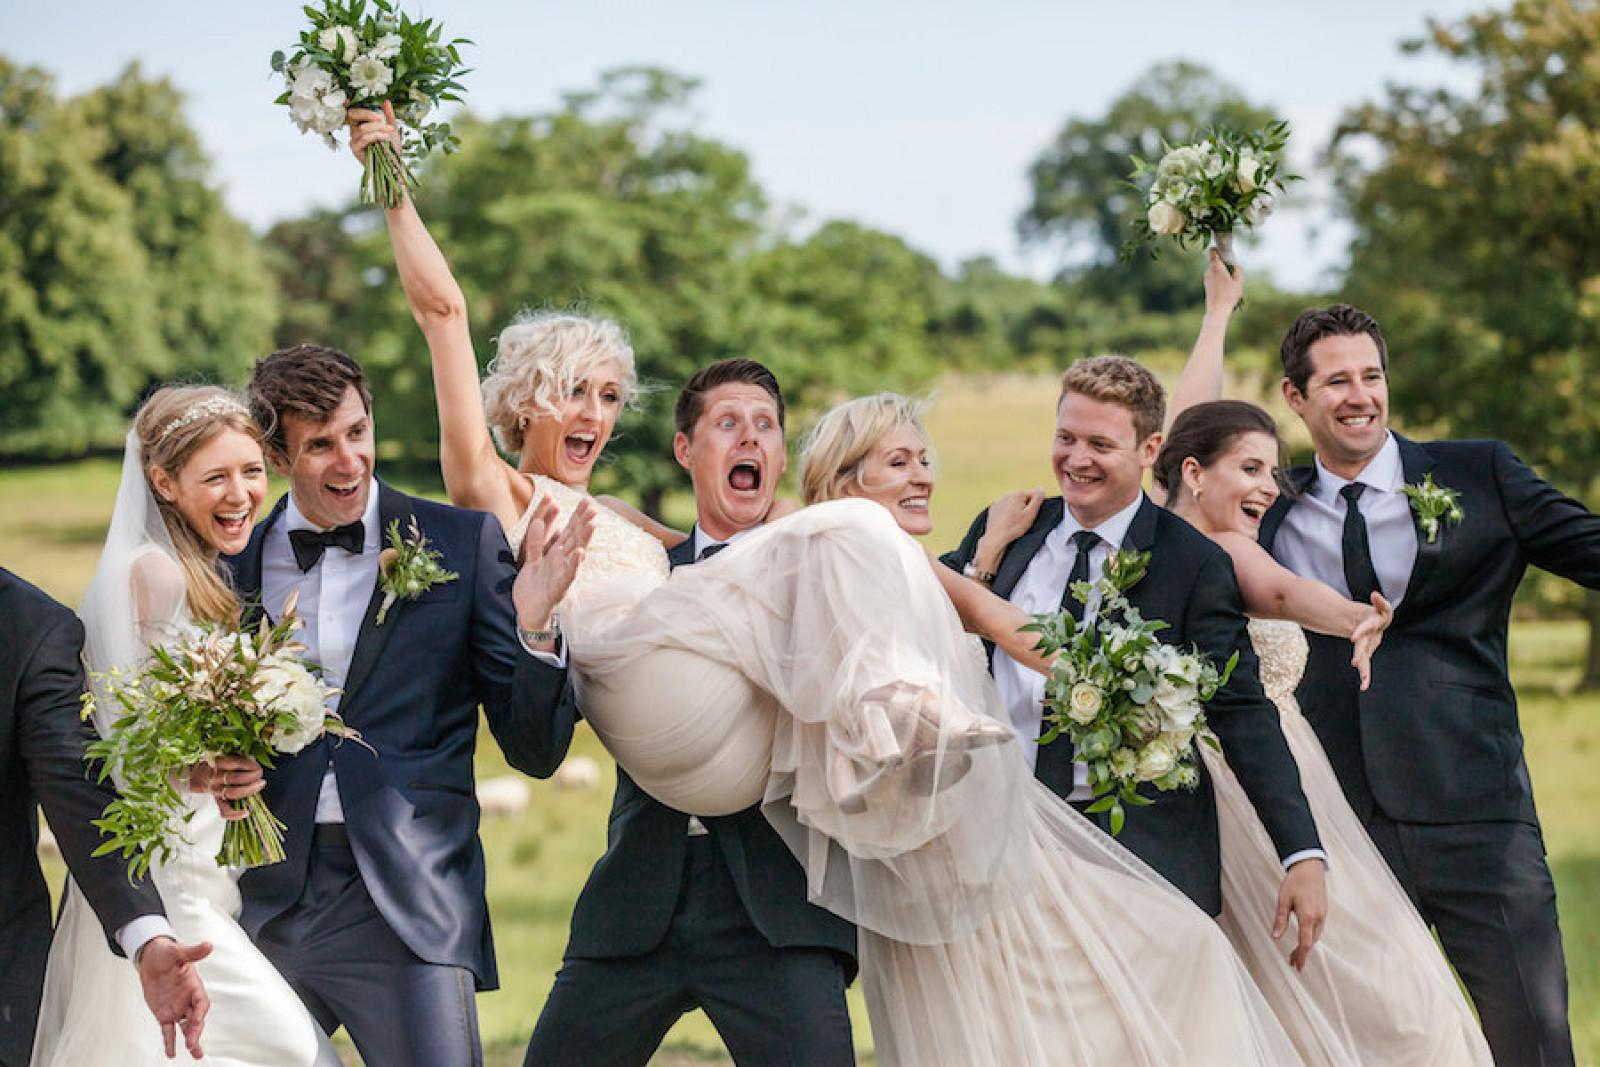 finding a wedding planner Wedding Decor Ideas